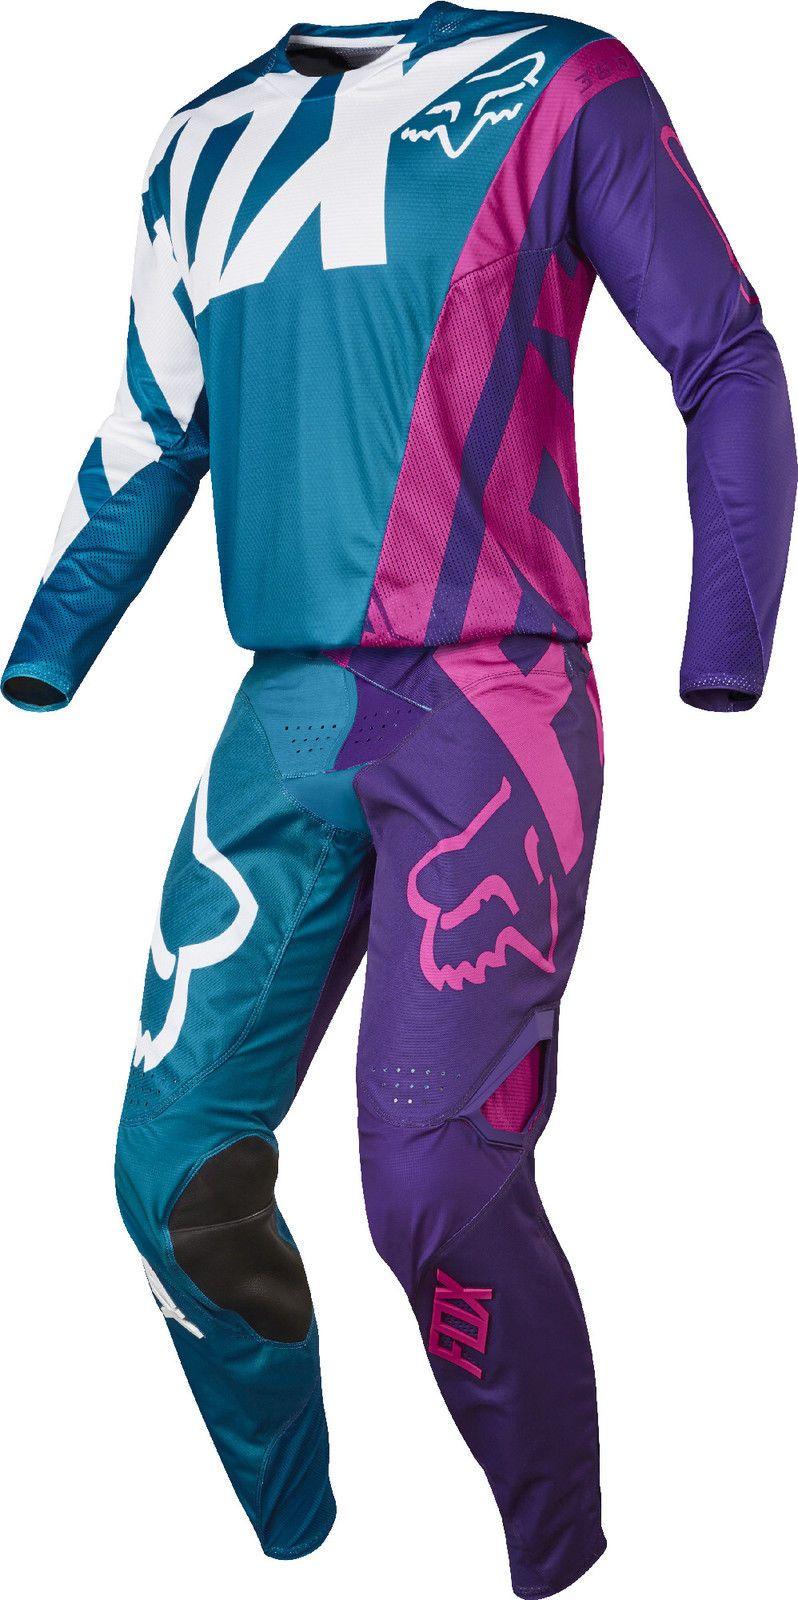 Fox Racing Mens Teal Blue Pink Purple White 360 Creo Dirt Bike Jersey Pants Kit